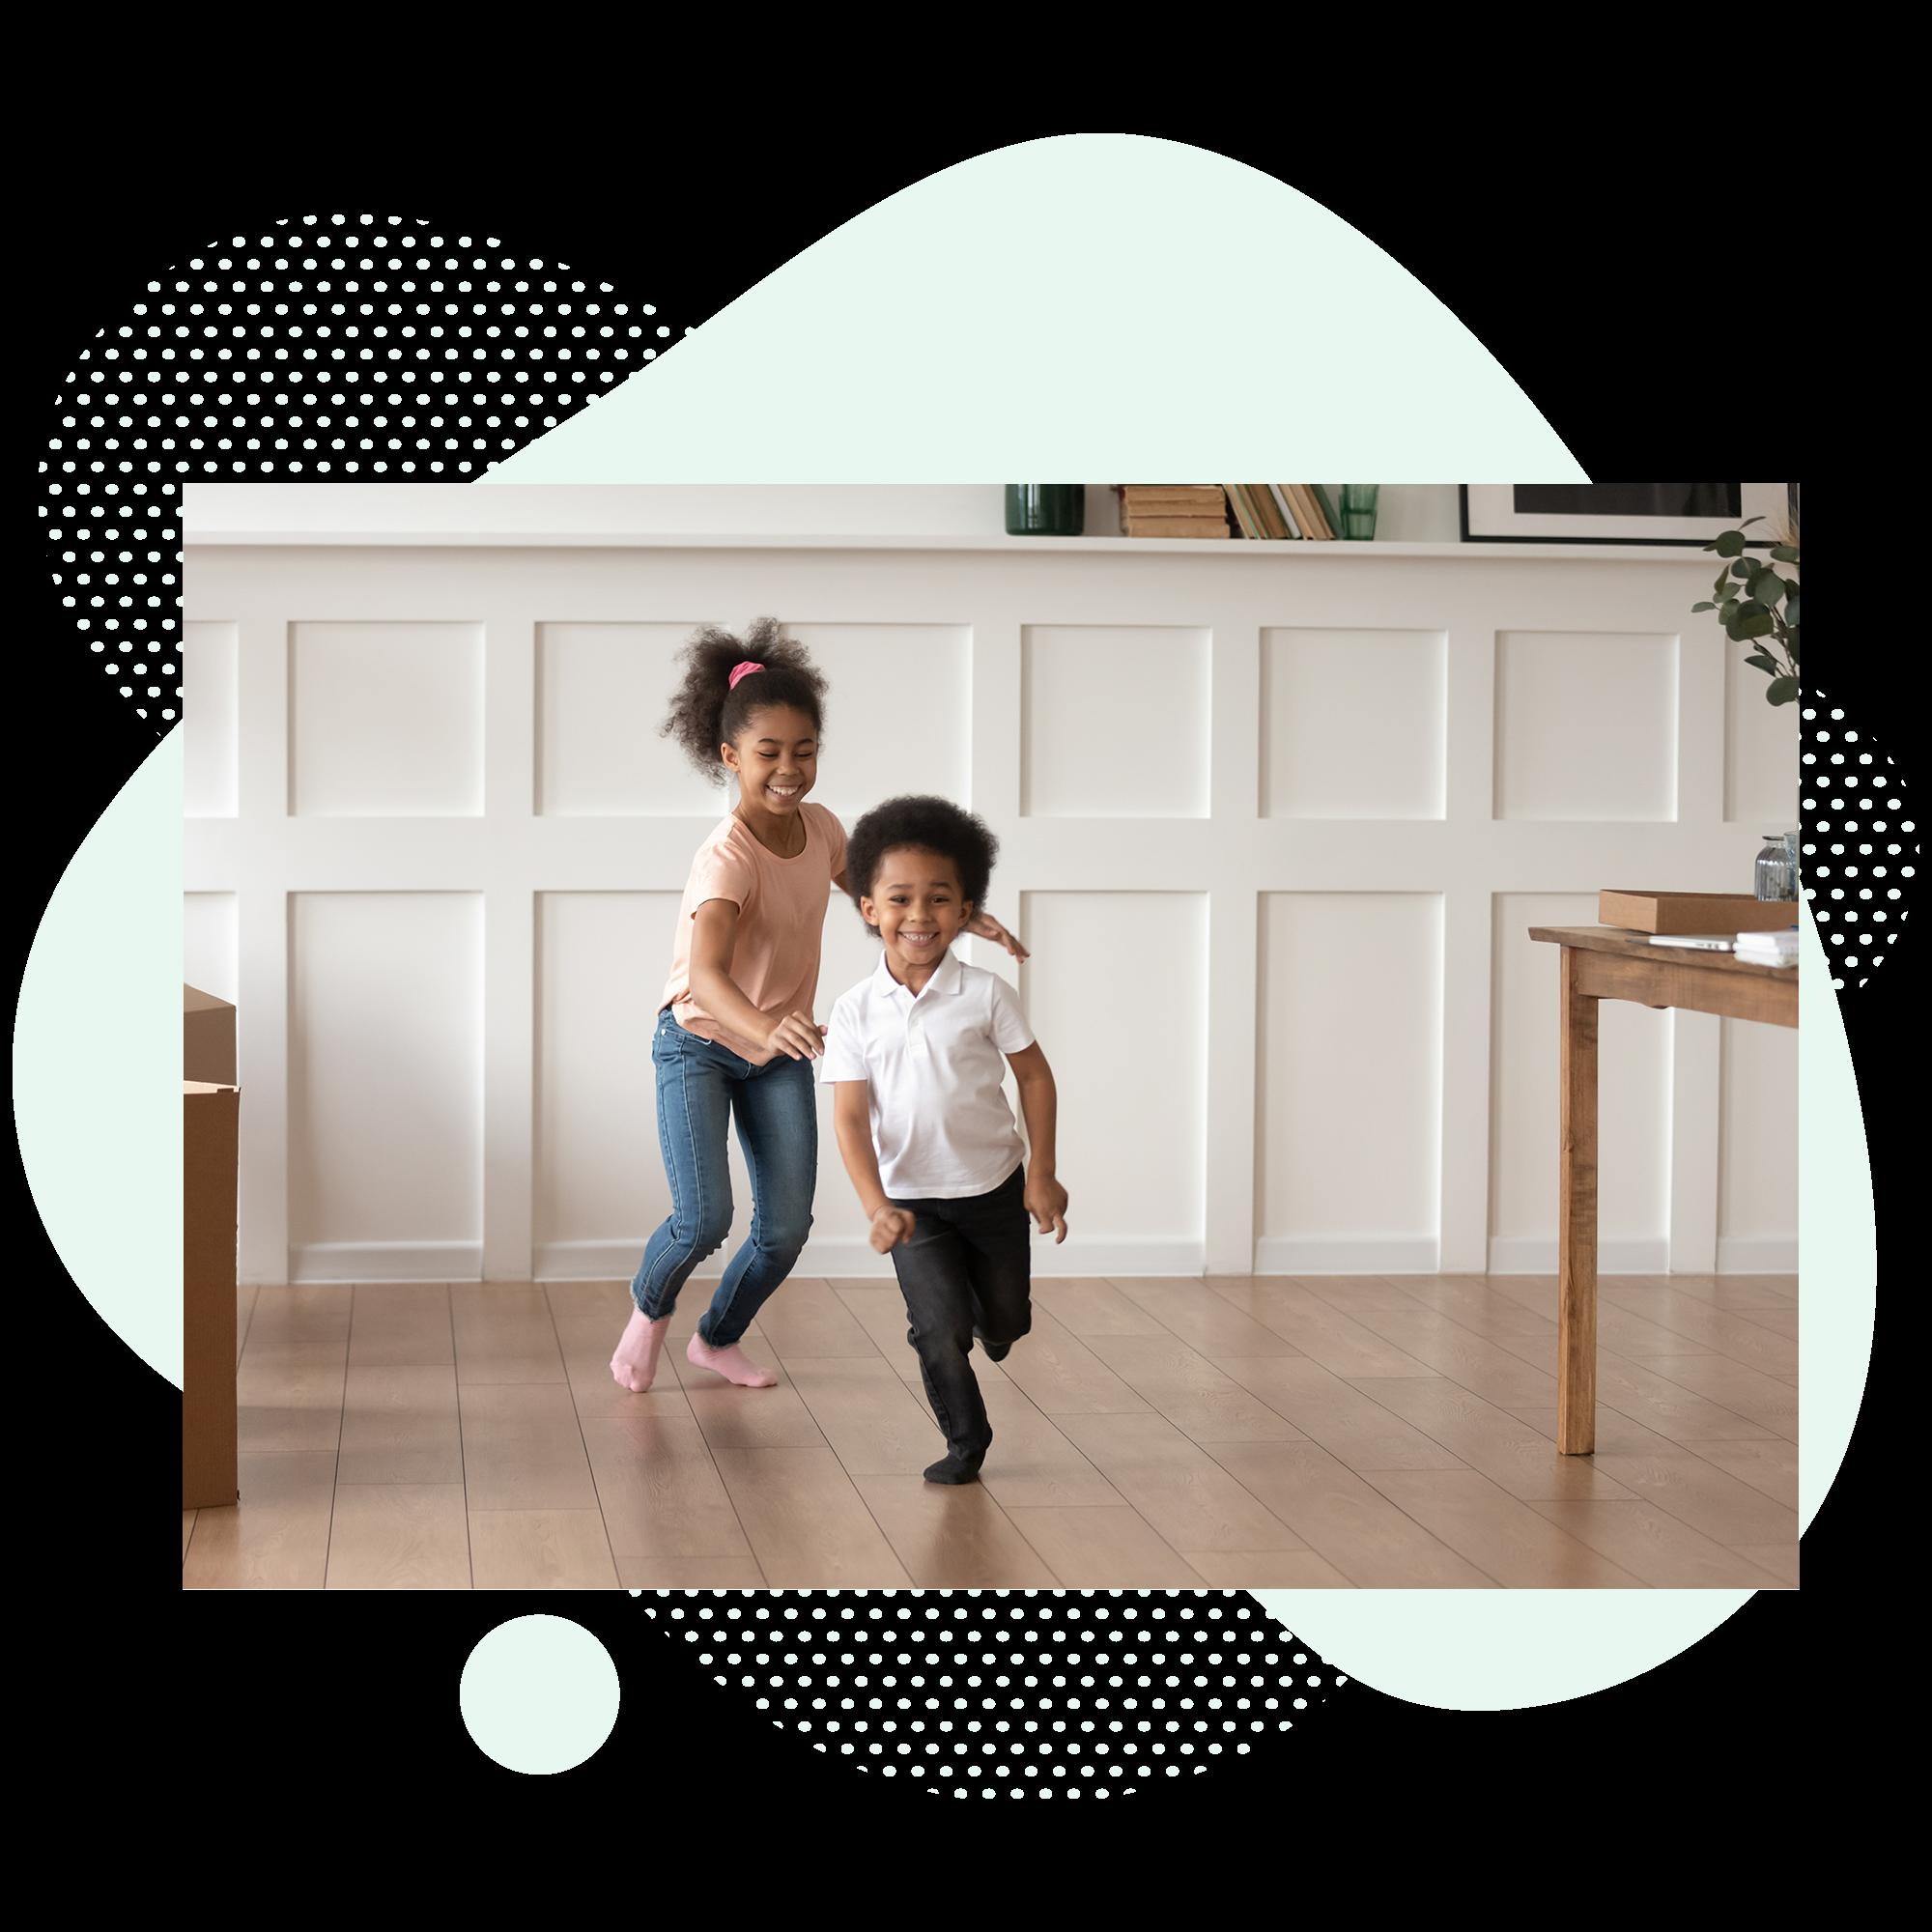 Two kids running down a hallway